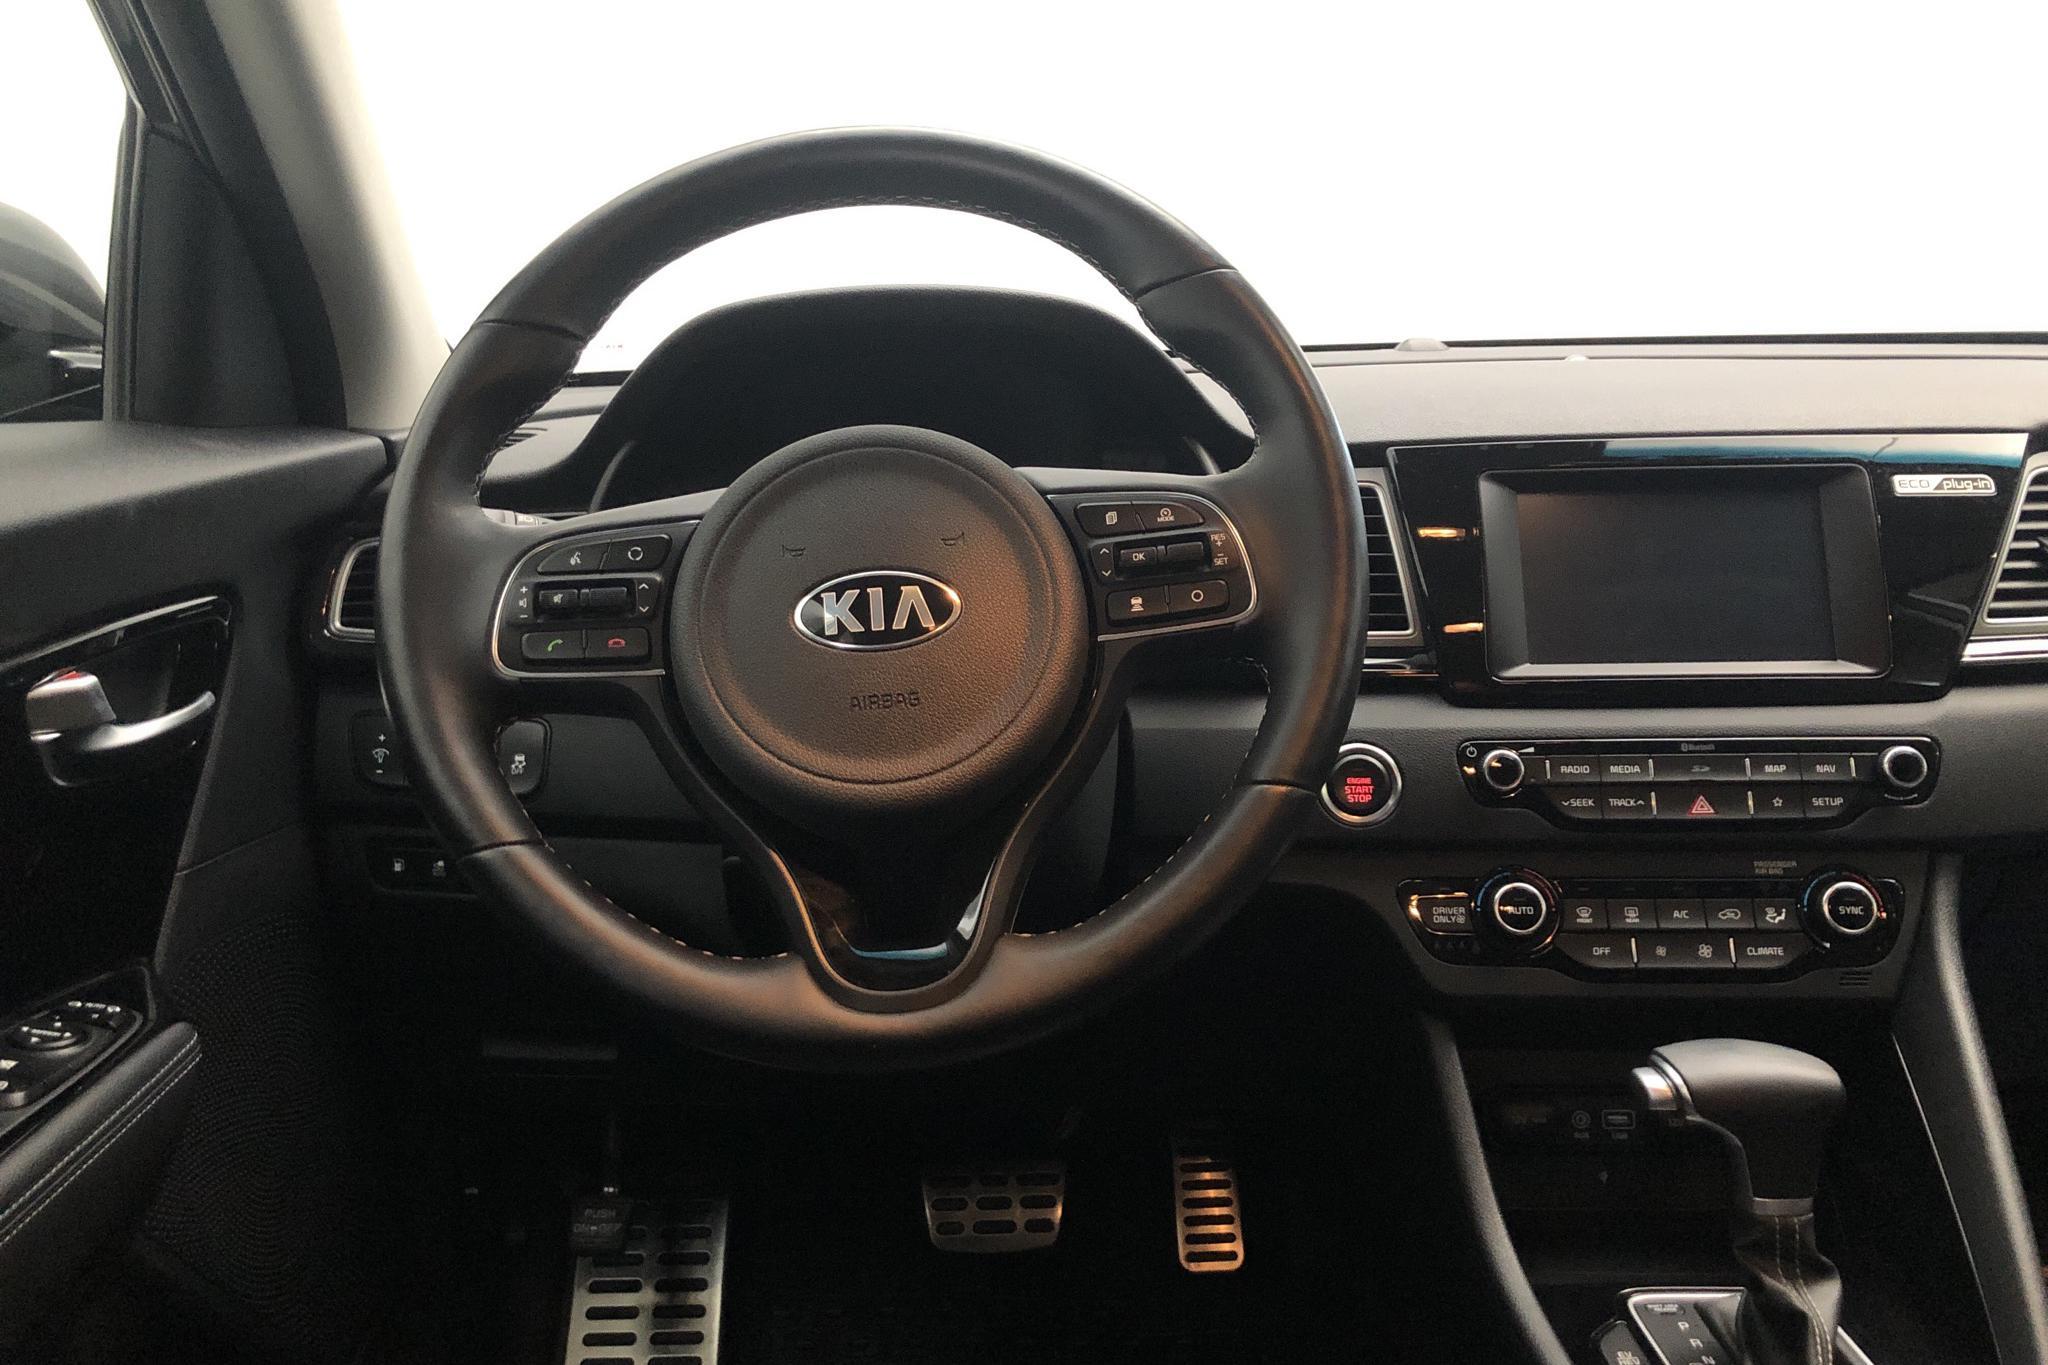 KIA Niro Plug-in Hybrid 1.6 (141hk) - 24 920 km - Automatic - gray - 2019